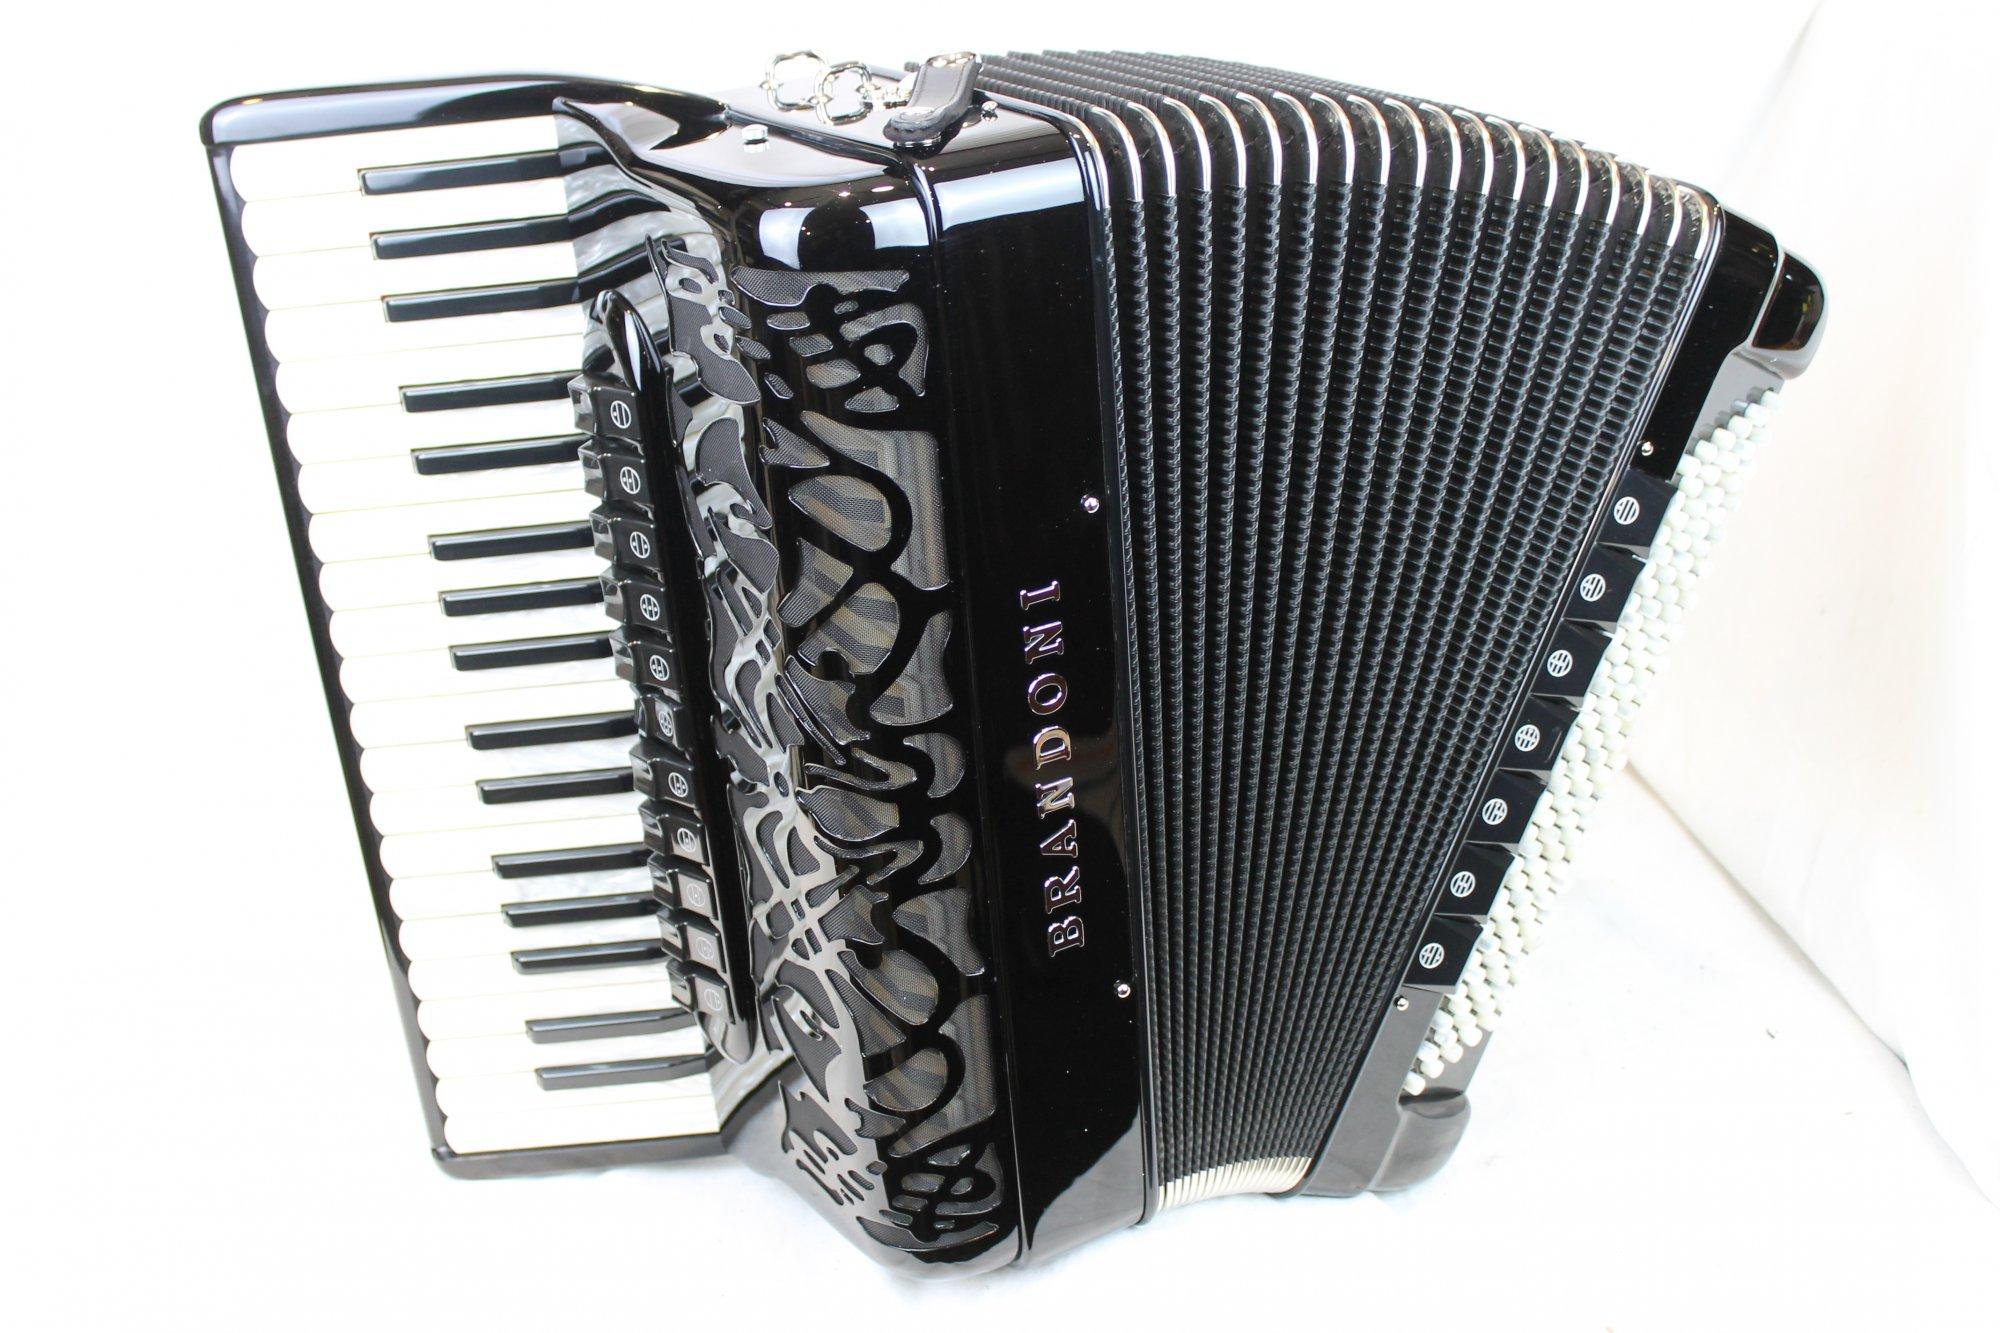 NEW Black Brandoni 130 Liberty Piano Accordion LMMH 37 120